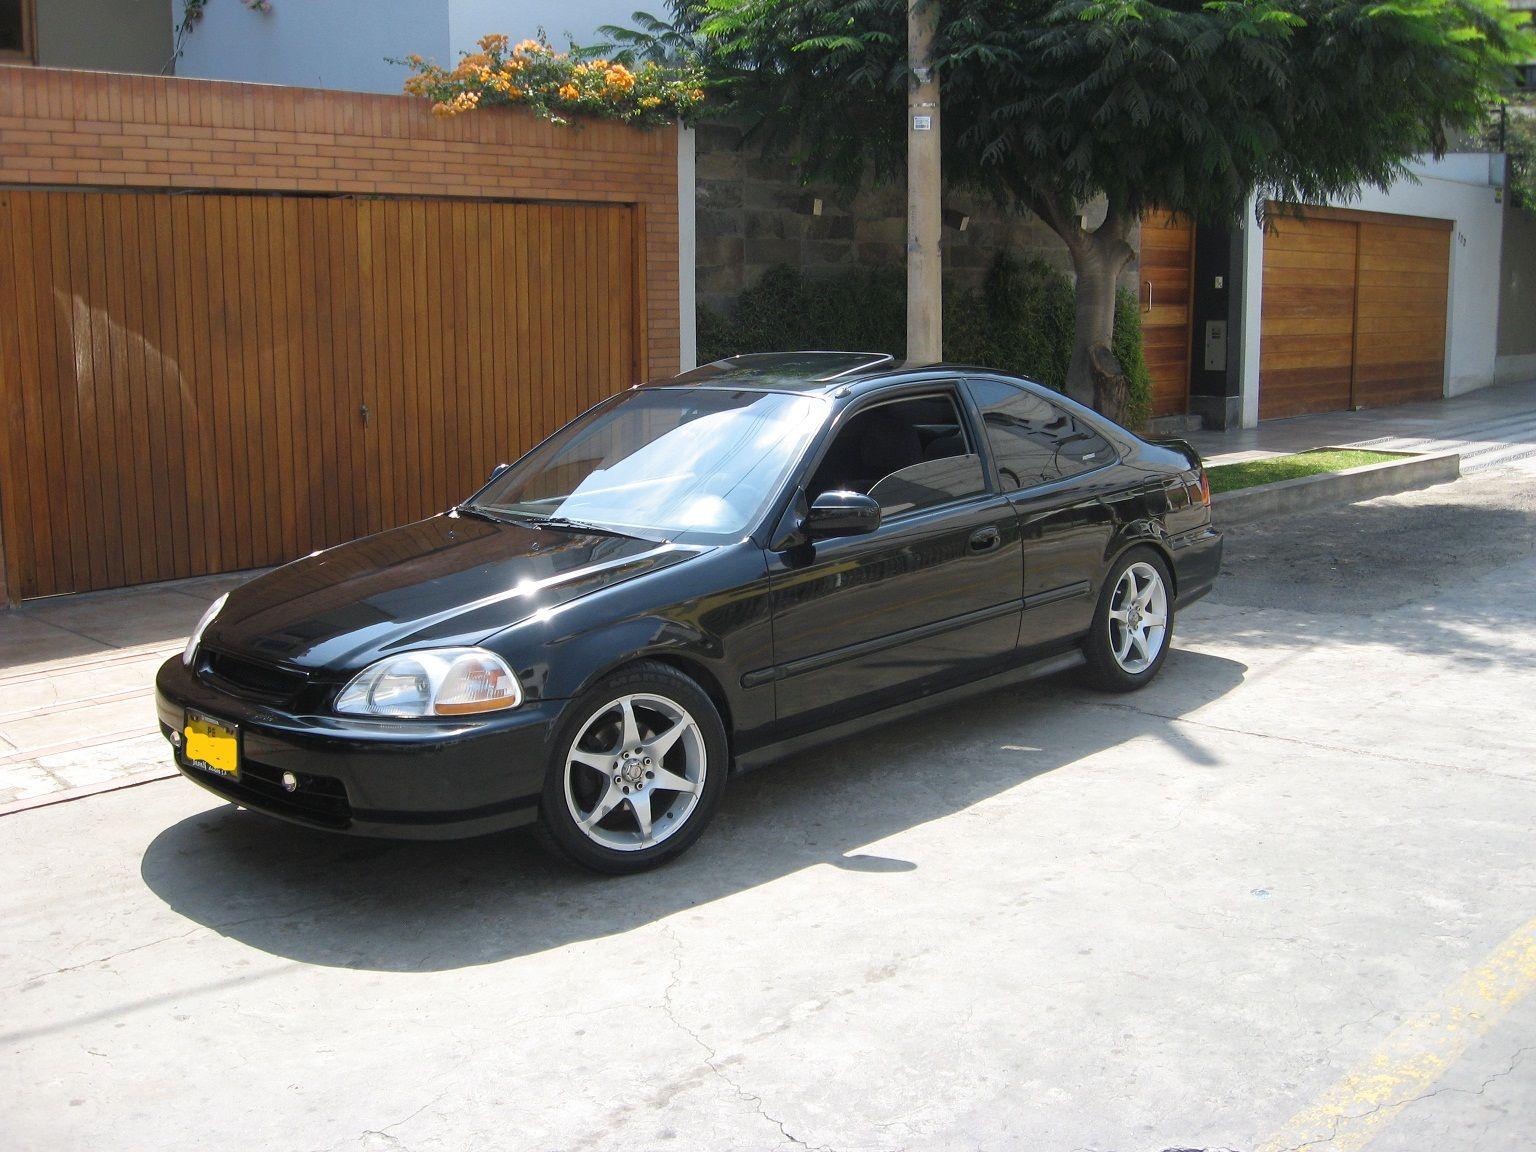 Honda Civic Ex Coupe 98 Img_2618